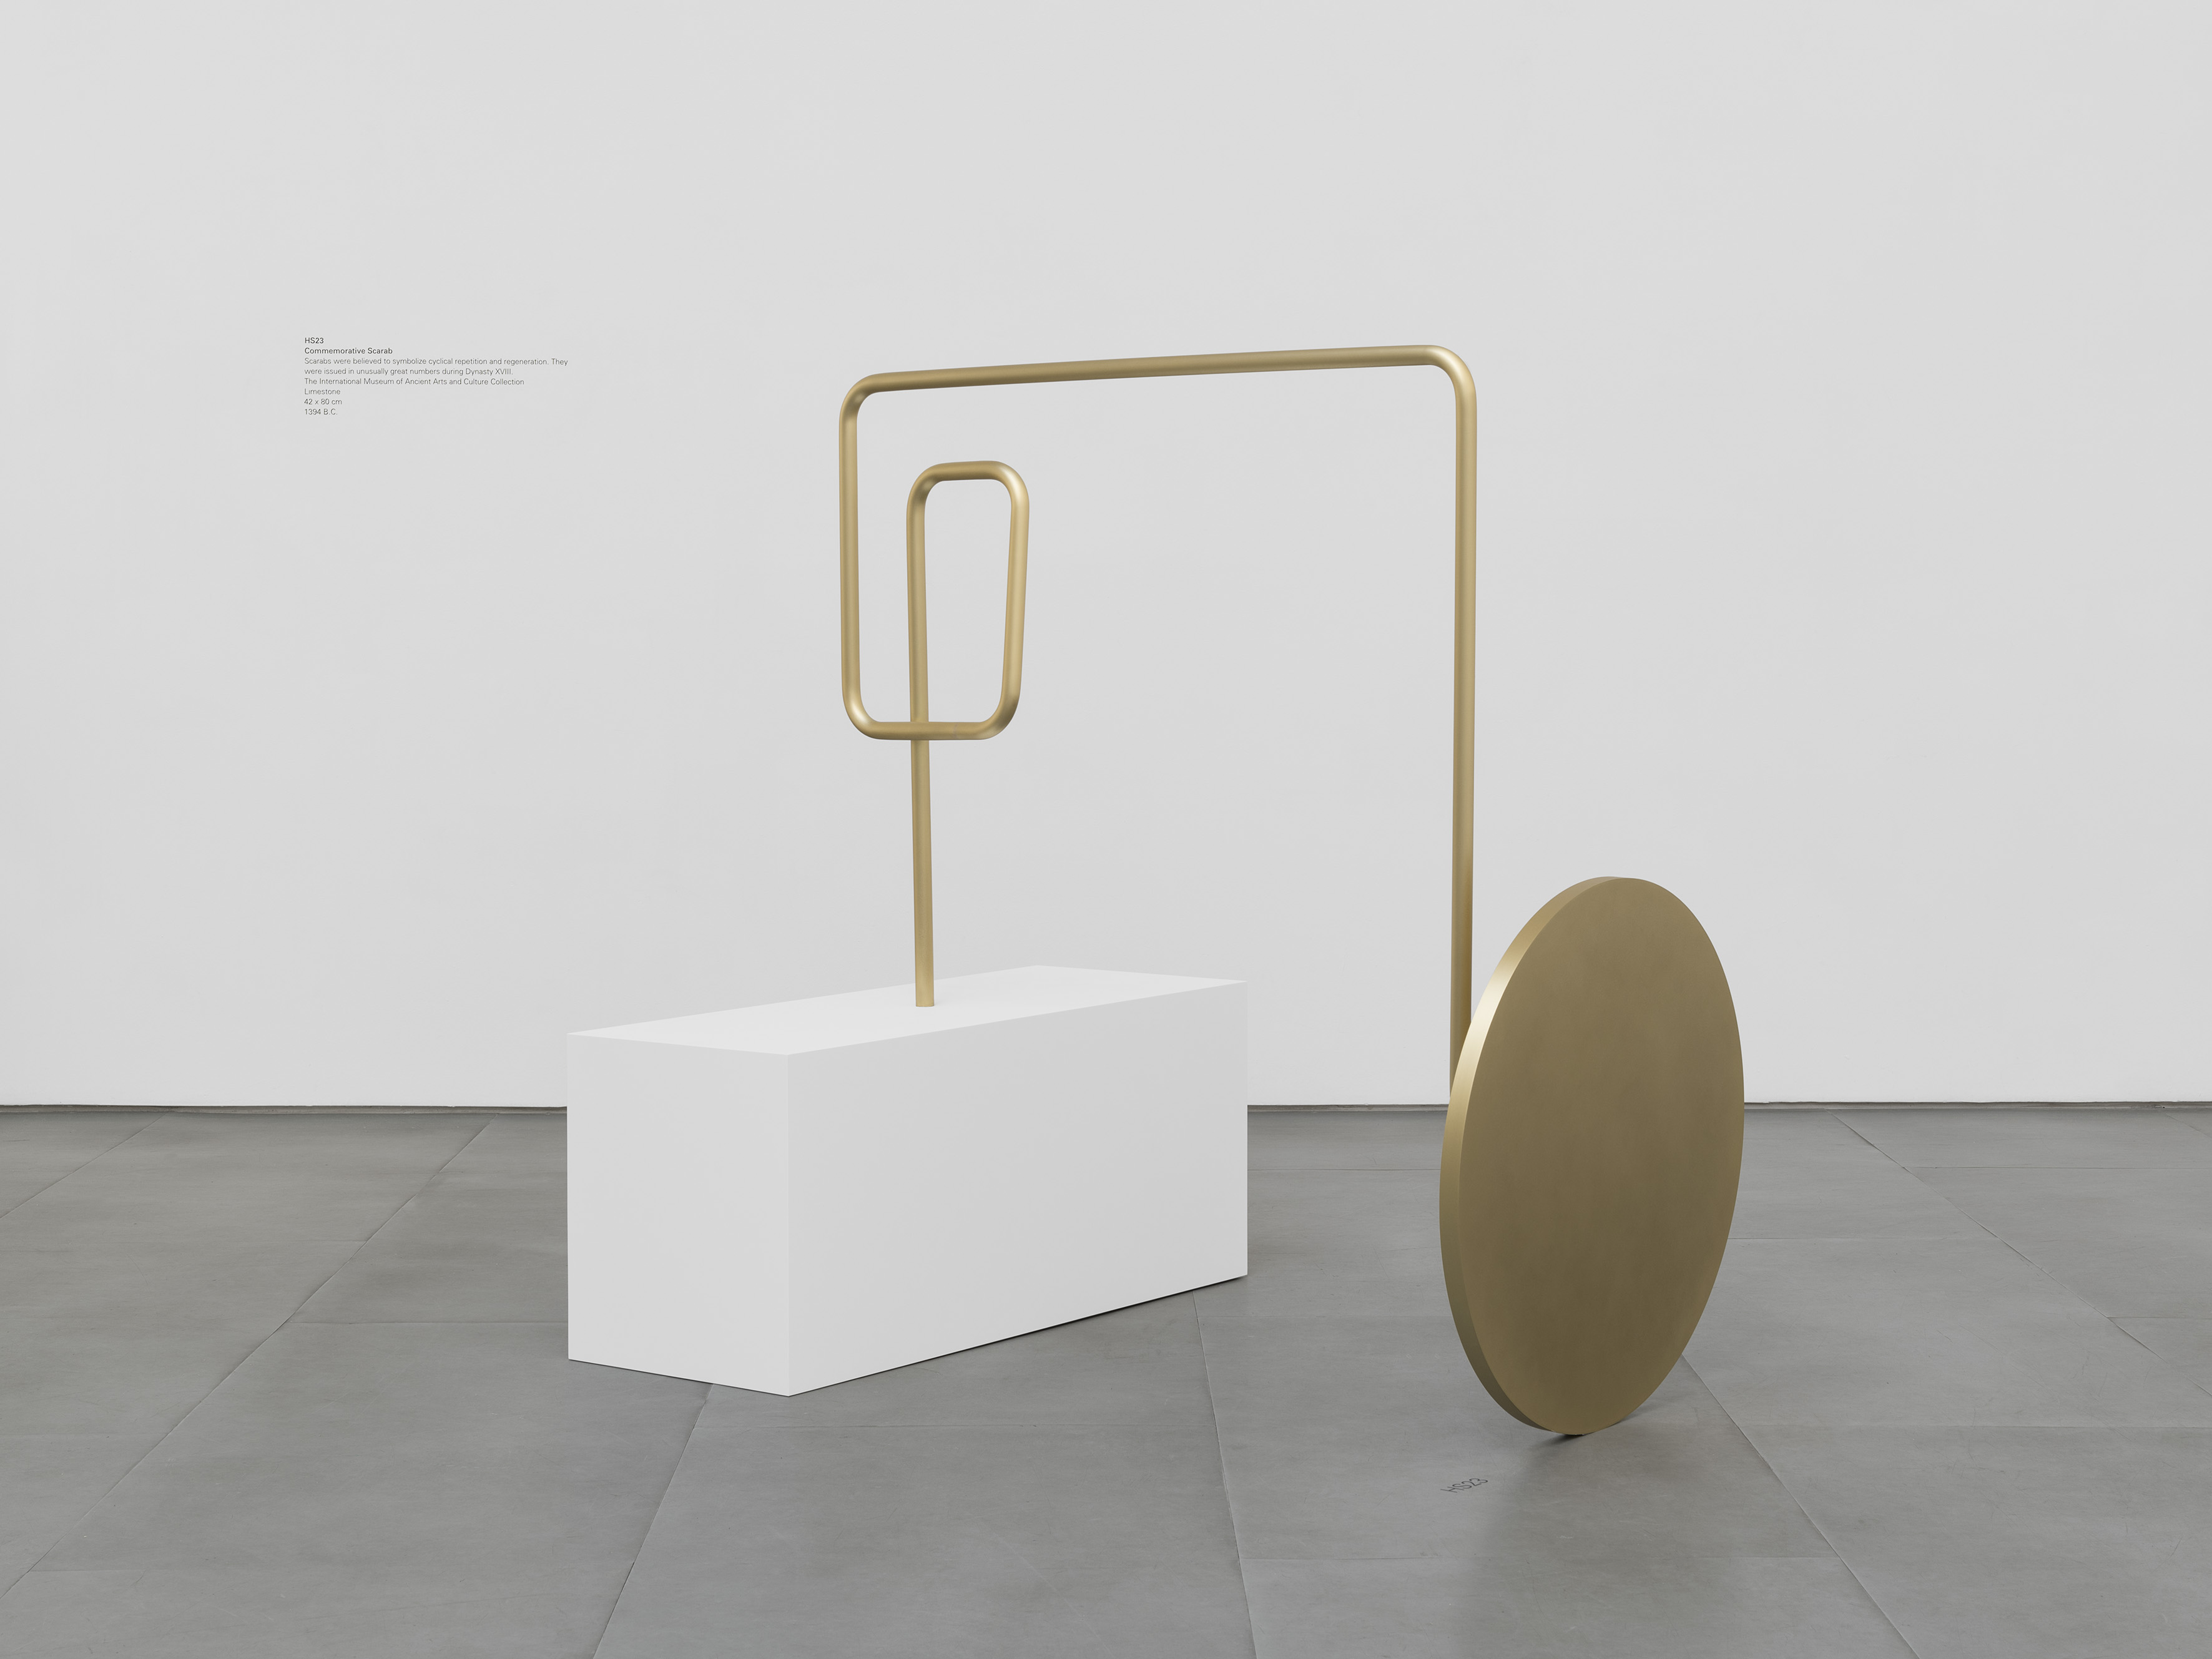 Iman Issa, Heritage Studies #23, 2016 Brass, Painted Wood (141 X